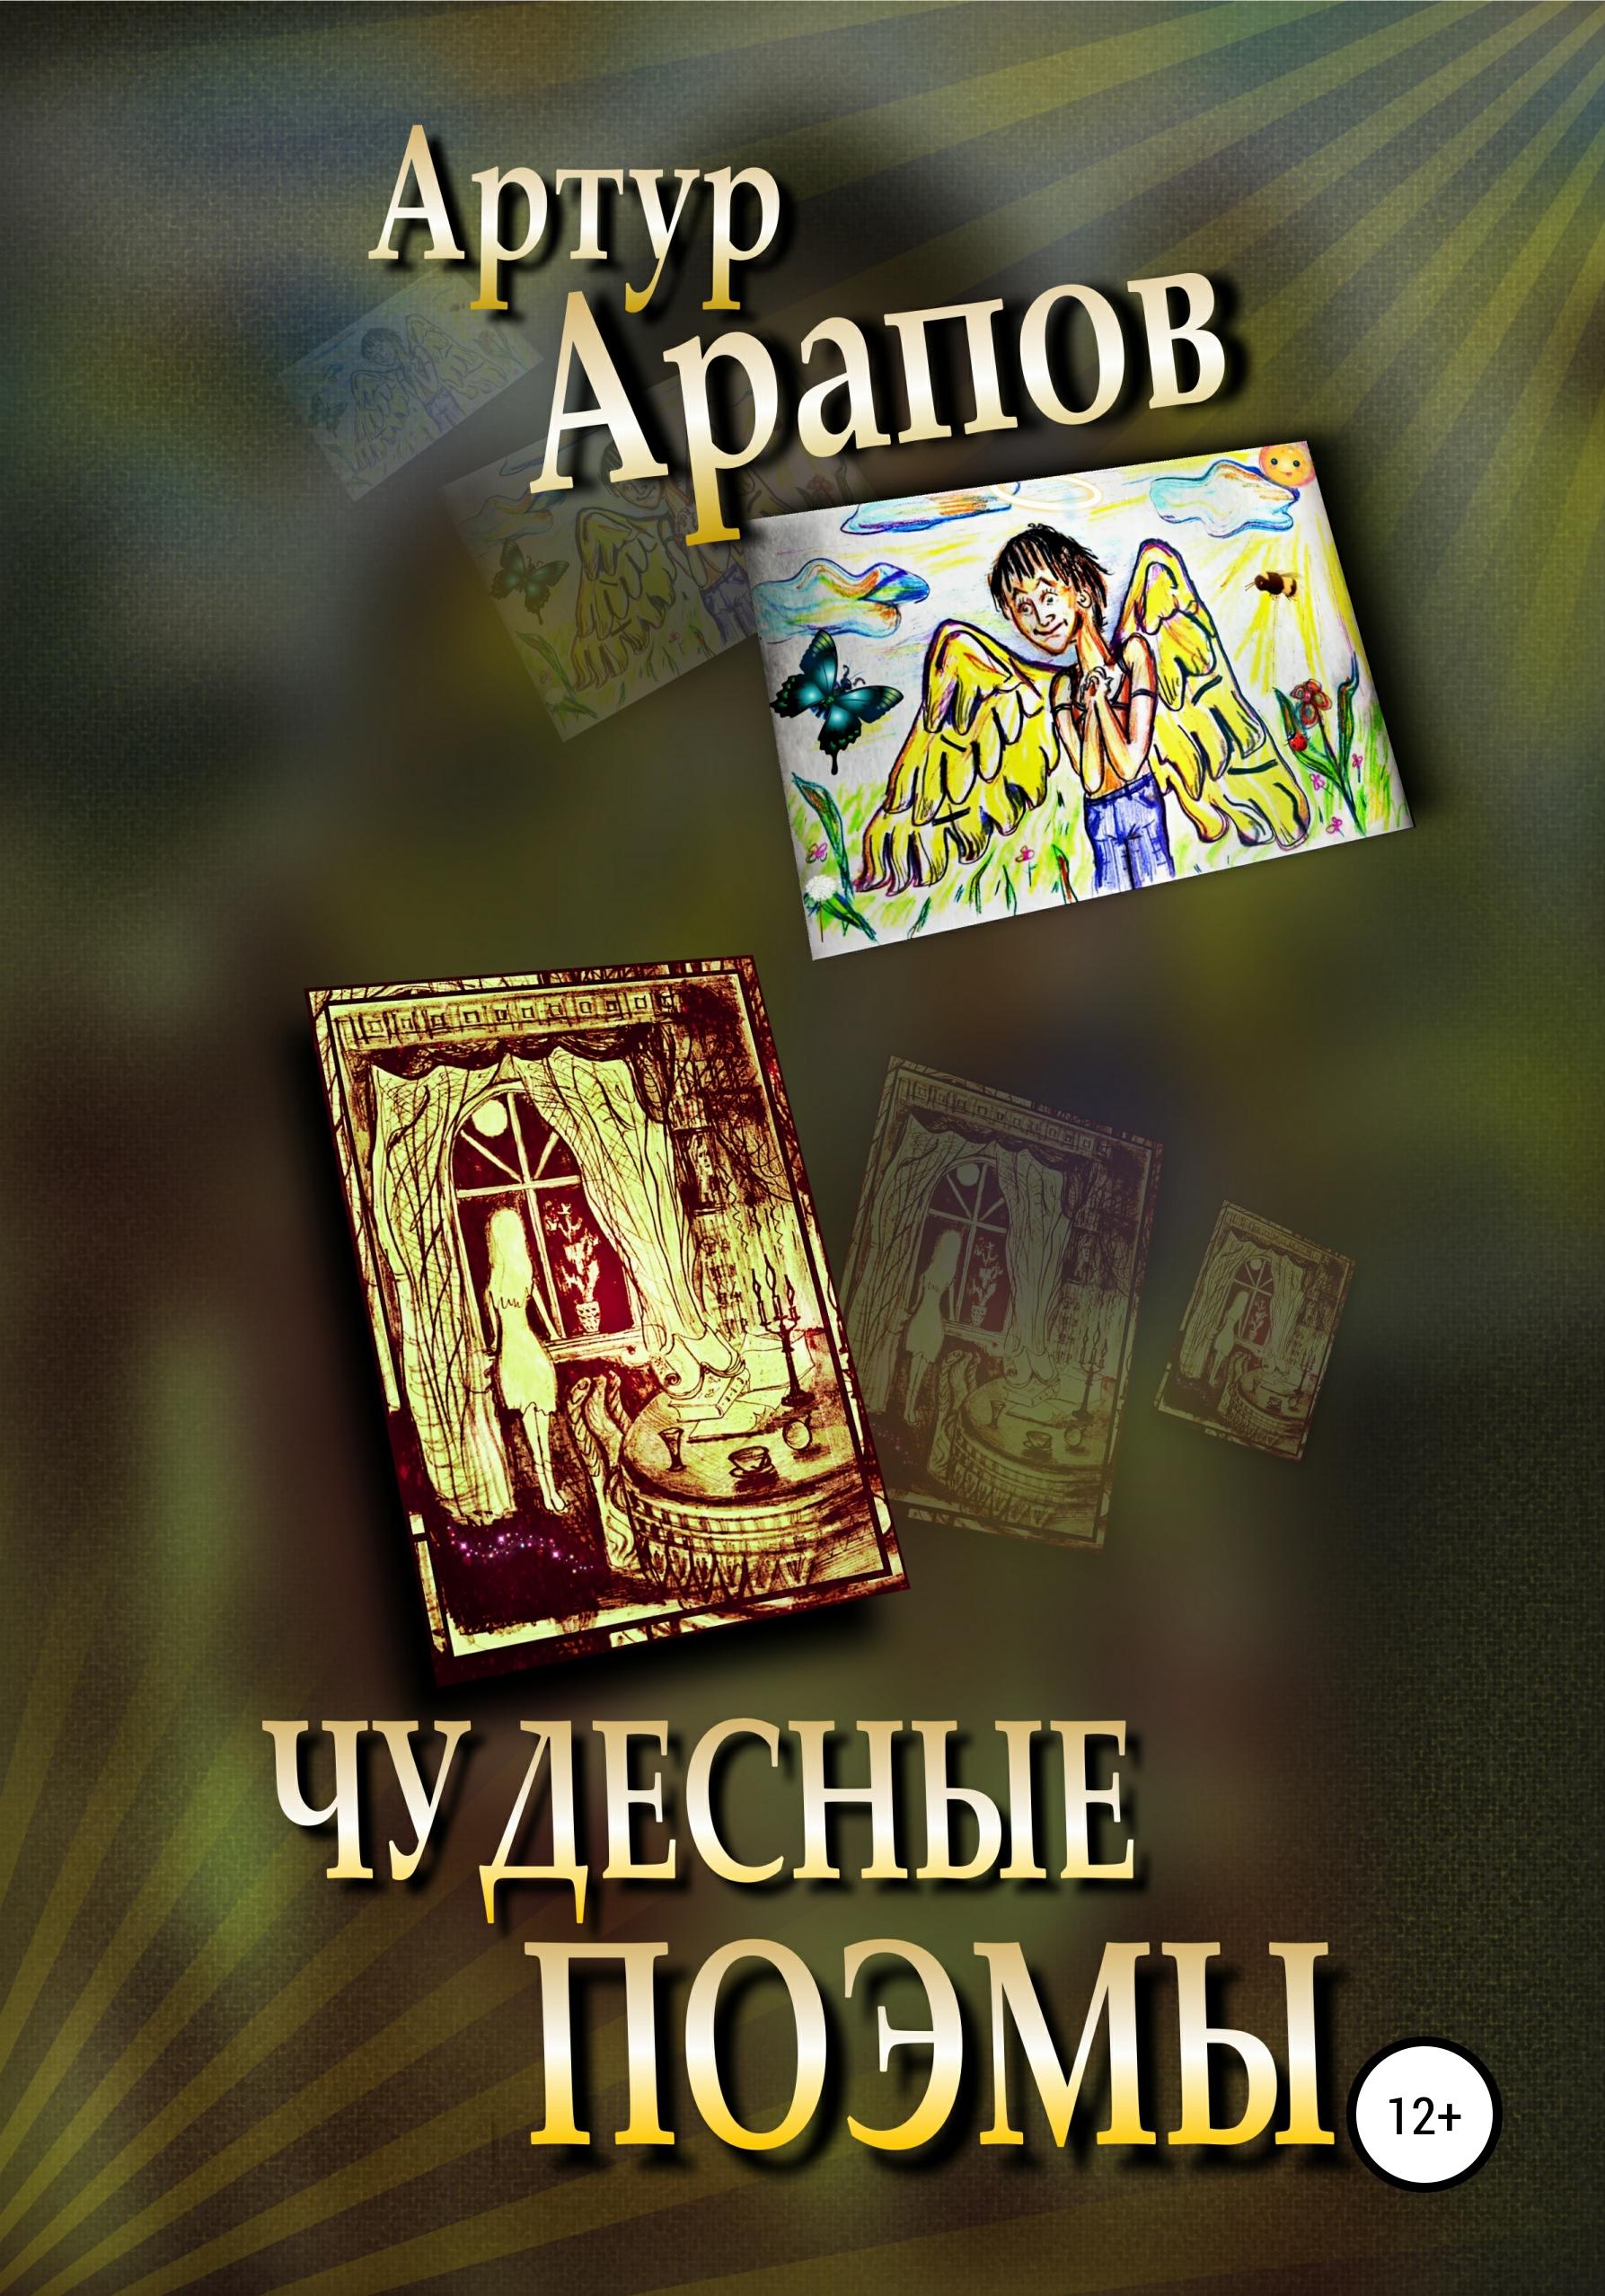 Артур Арапов Чудесные поэмы. Сборник цена